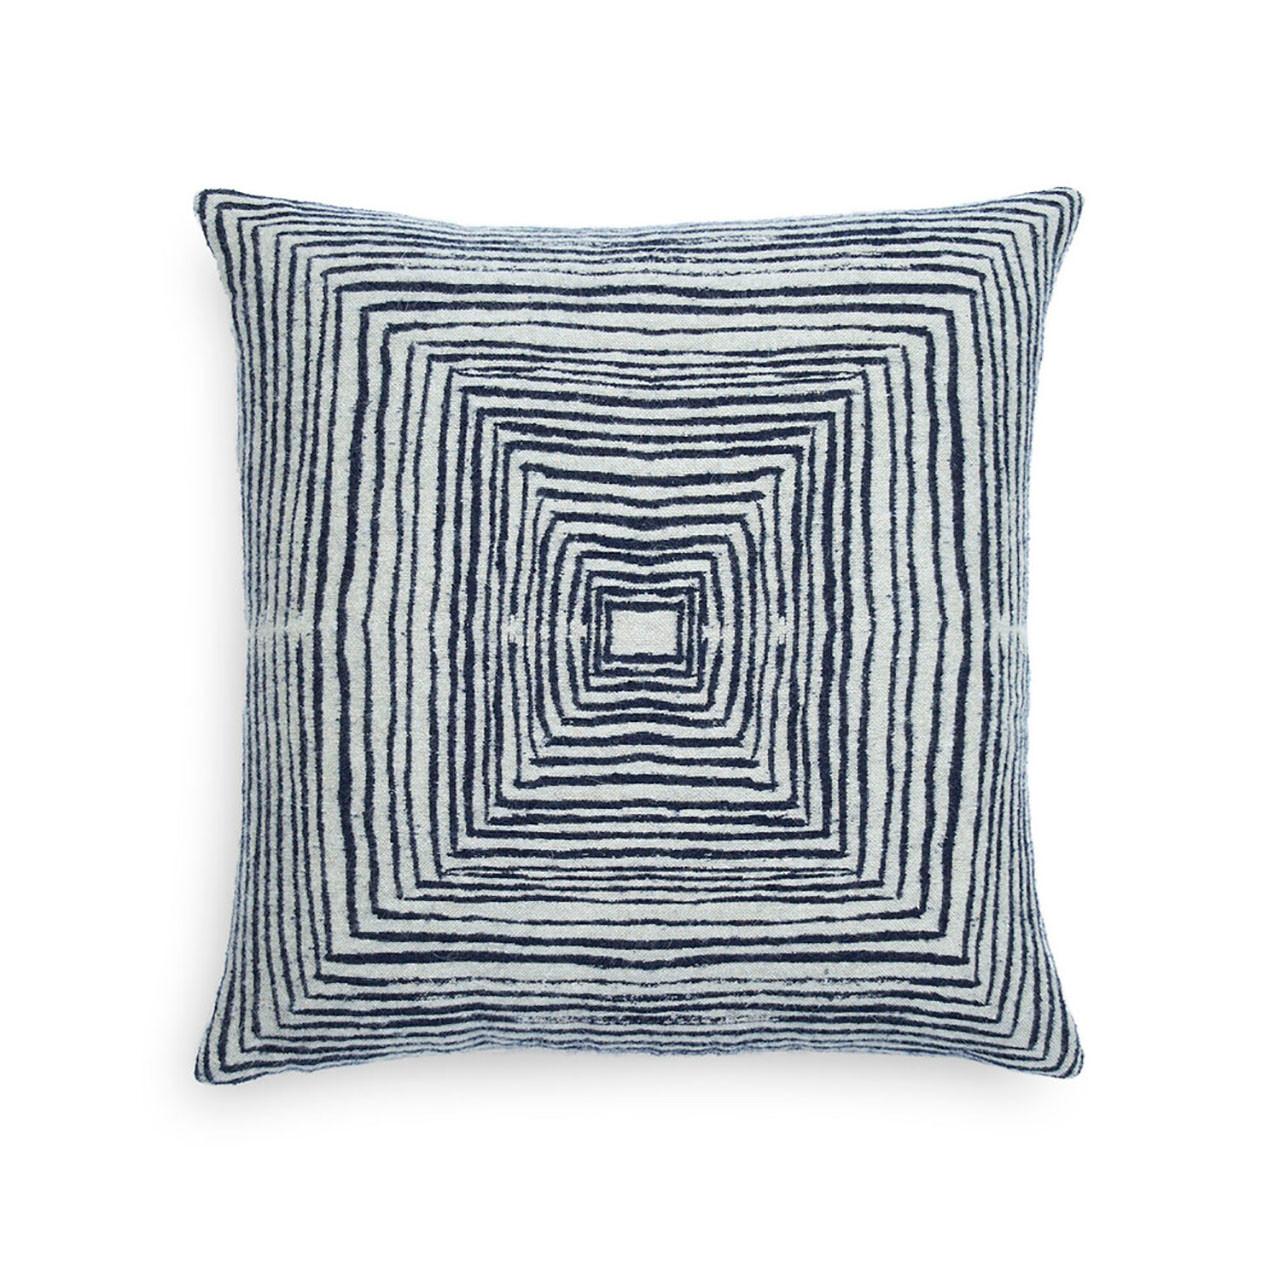 White Linear Square Pillow - Square